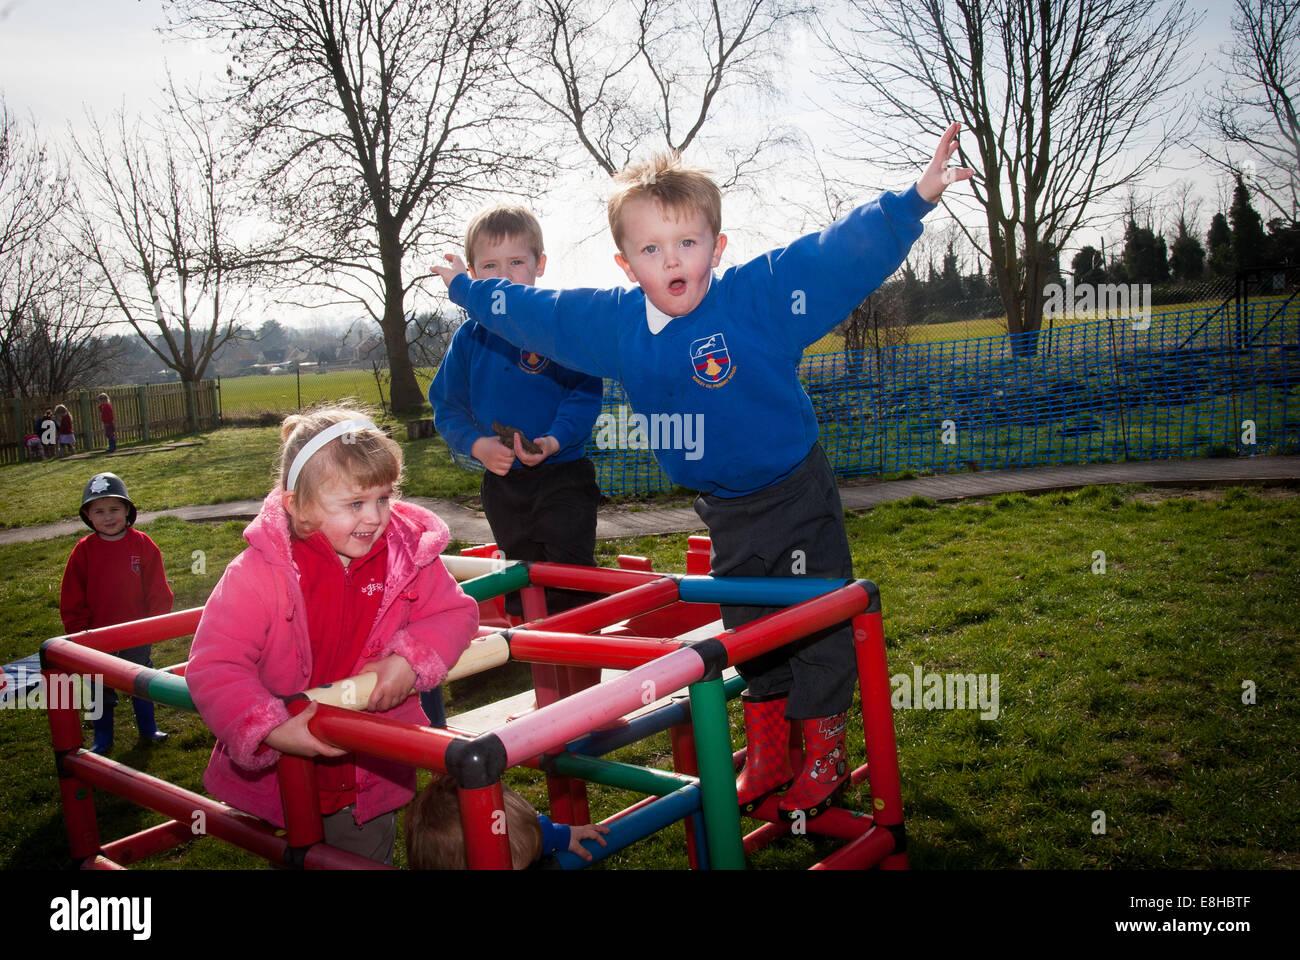 Children playing in the school playground